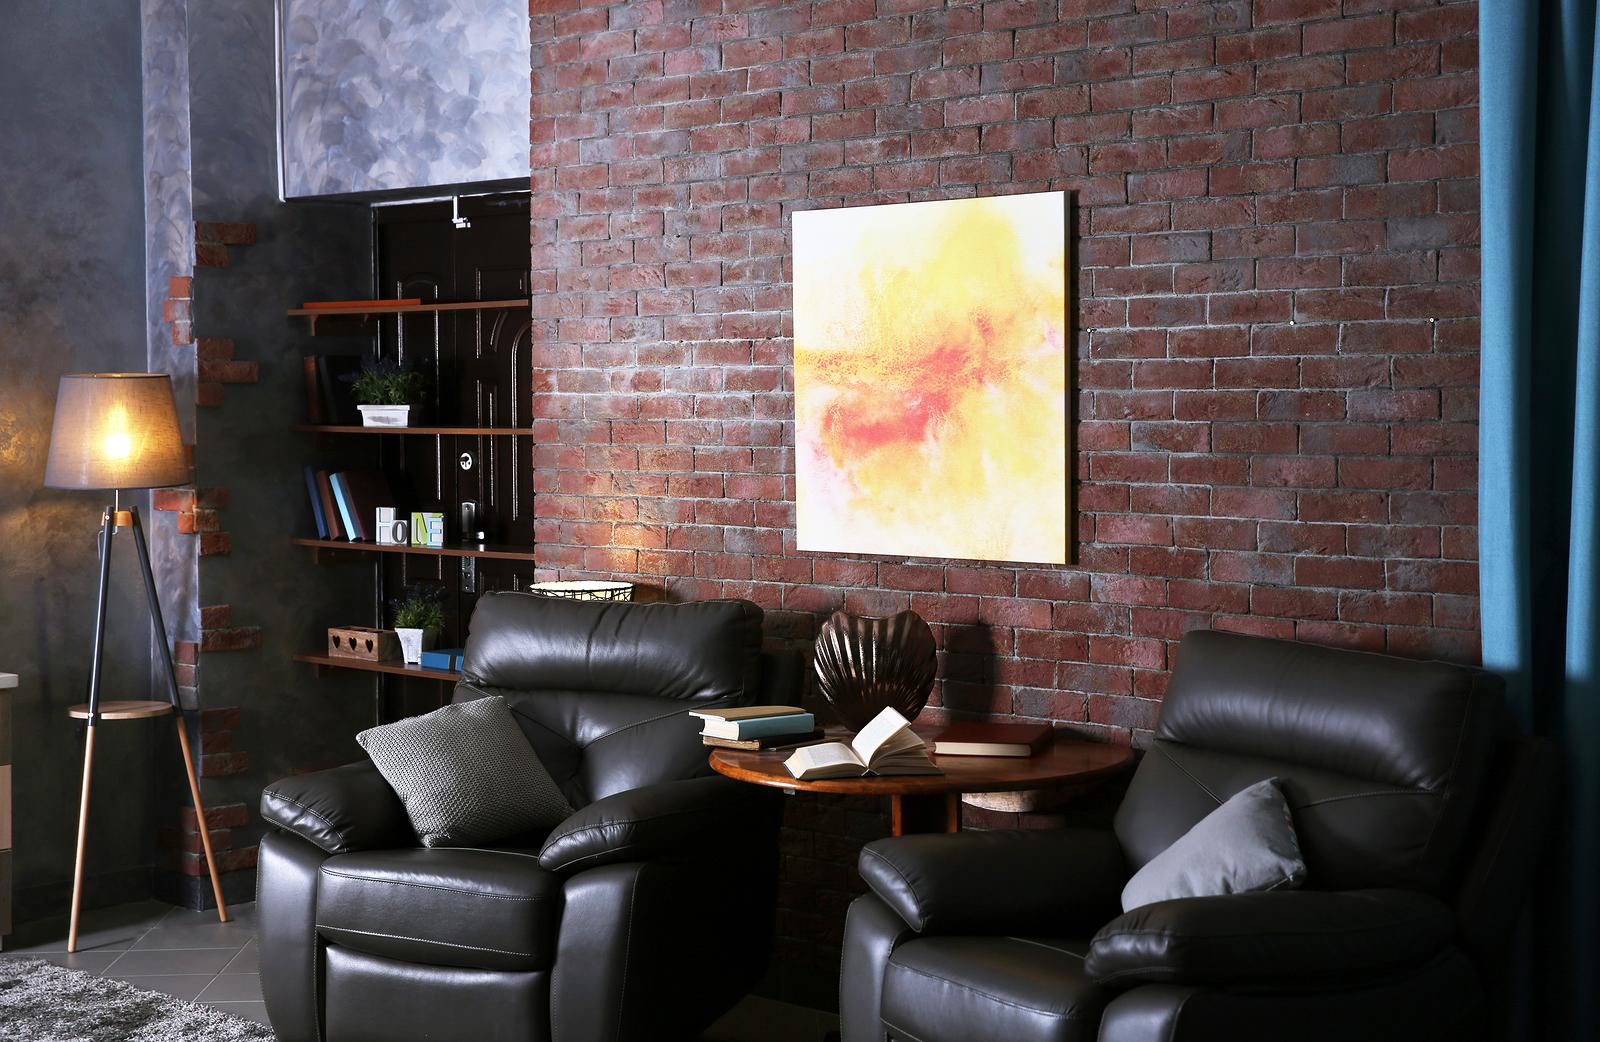 bigstock-Modern-living-room-interior-wi-118282922.jpg